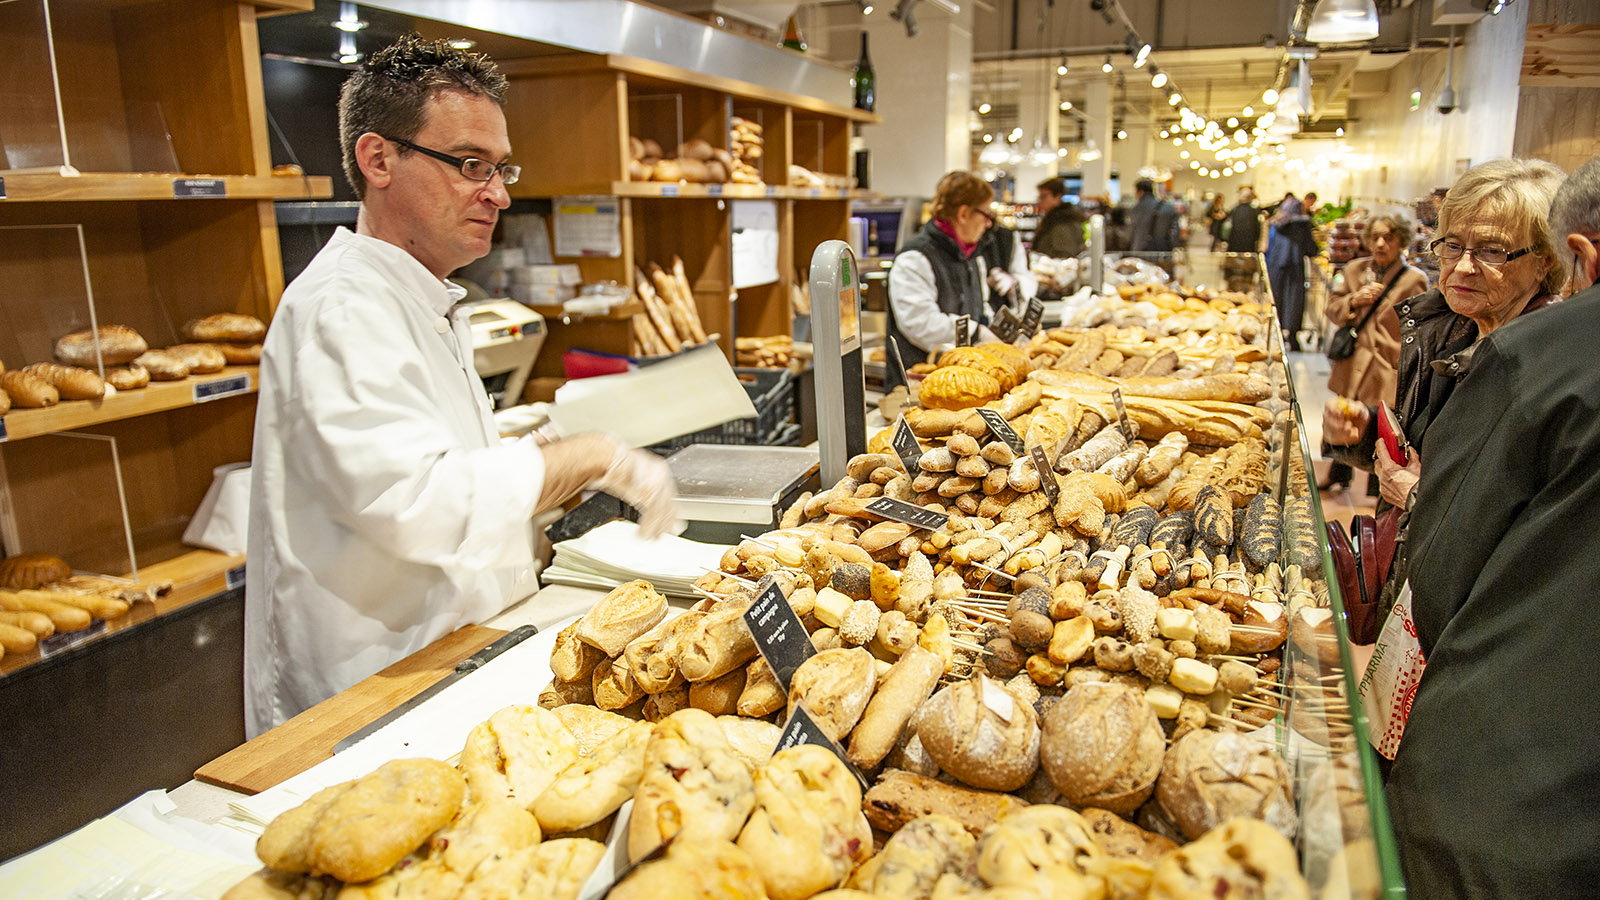 Le Bon Marché: die Grande Épicerie –reinste Verführung! Foto: Hilke Maunder